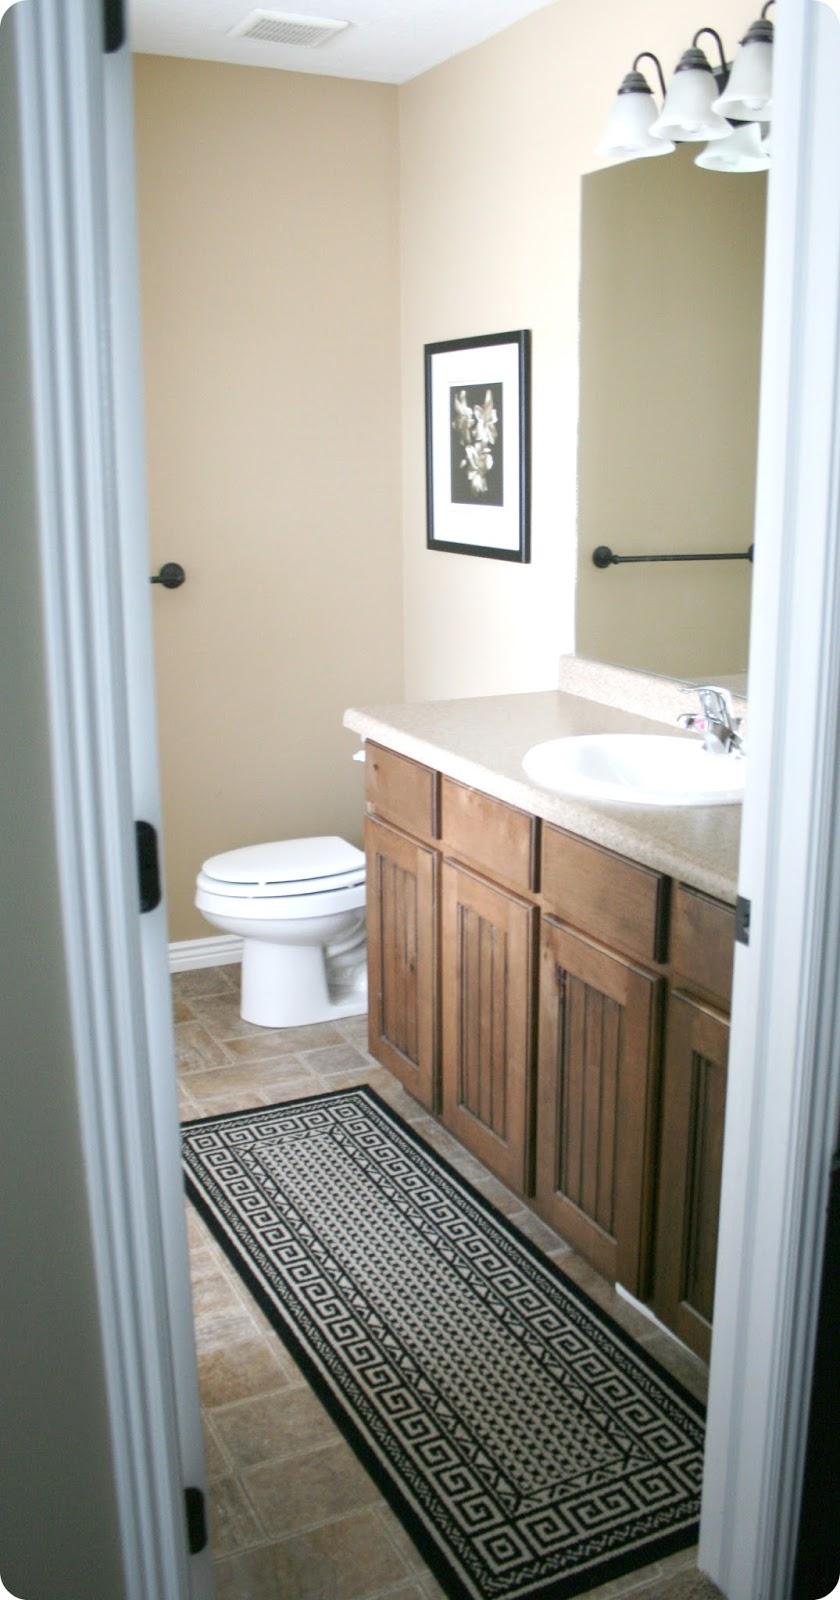 Our Master Bathroom Sliding Door & Basin Custom Hardware